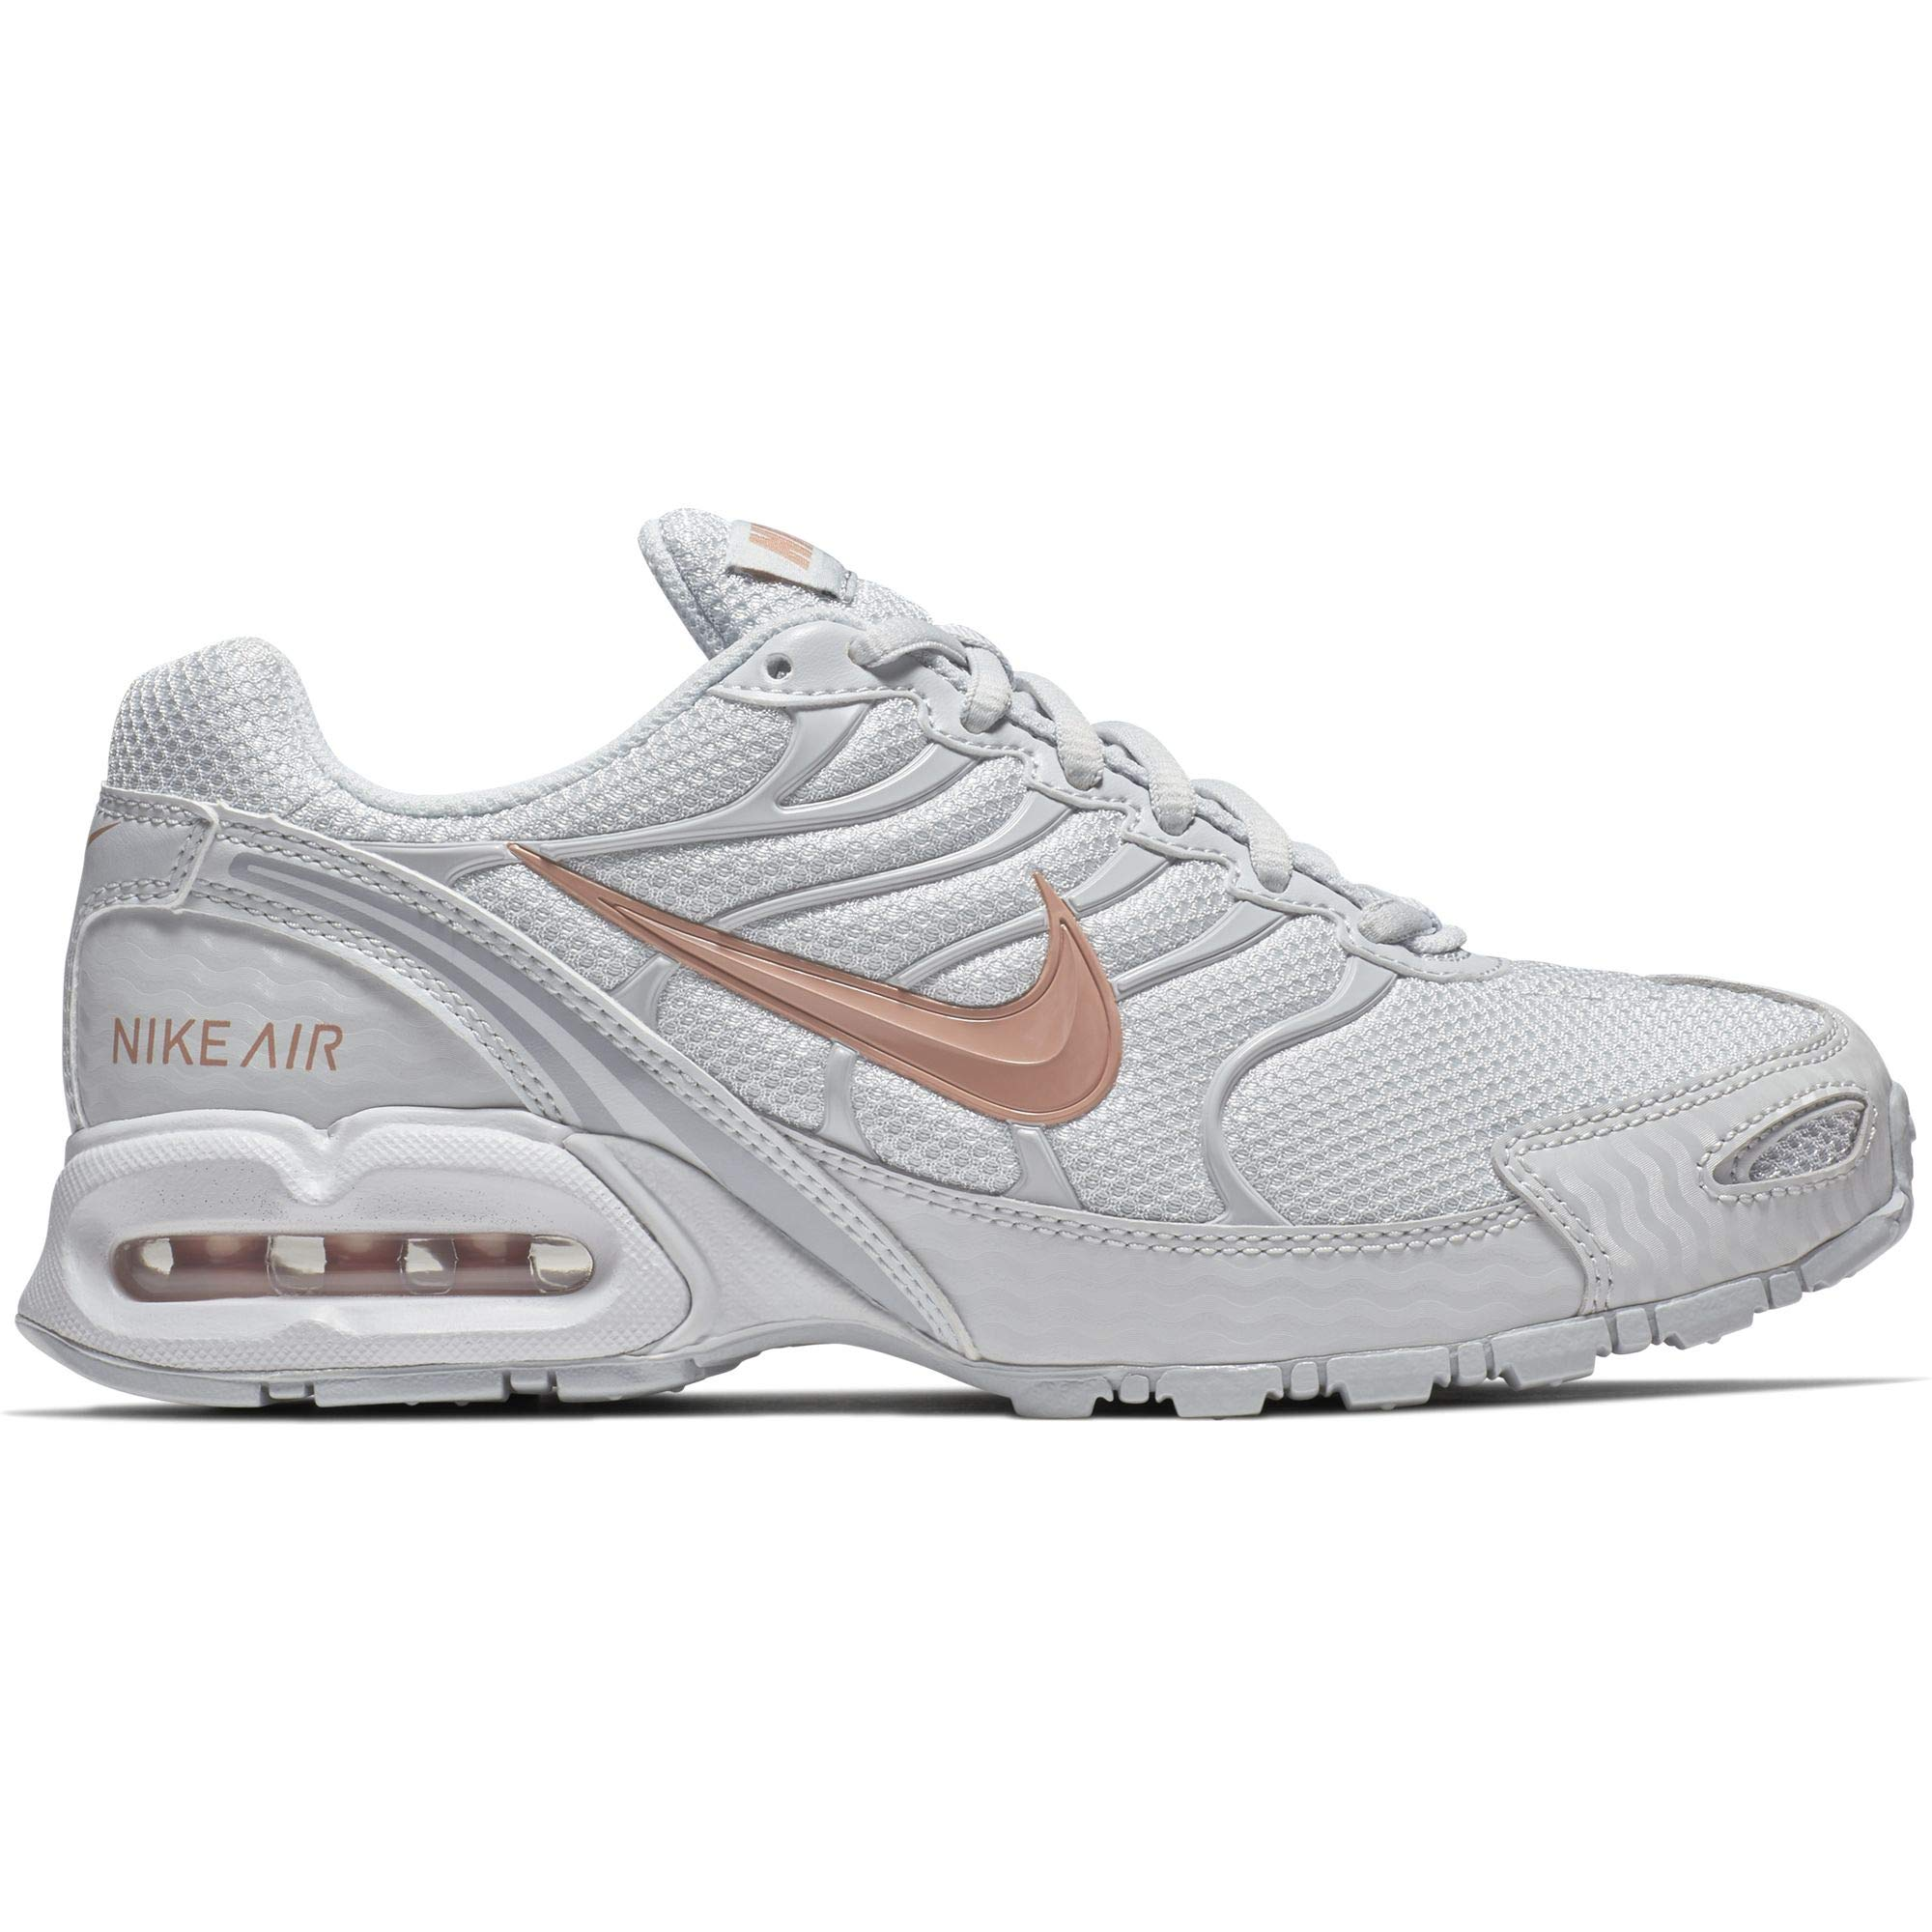 c403dea0091 Galleon - Nike Women s Air Max Torch 4 Running Shoes (9.5 M US